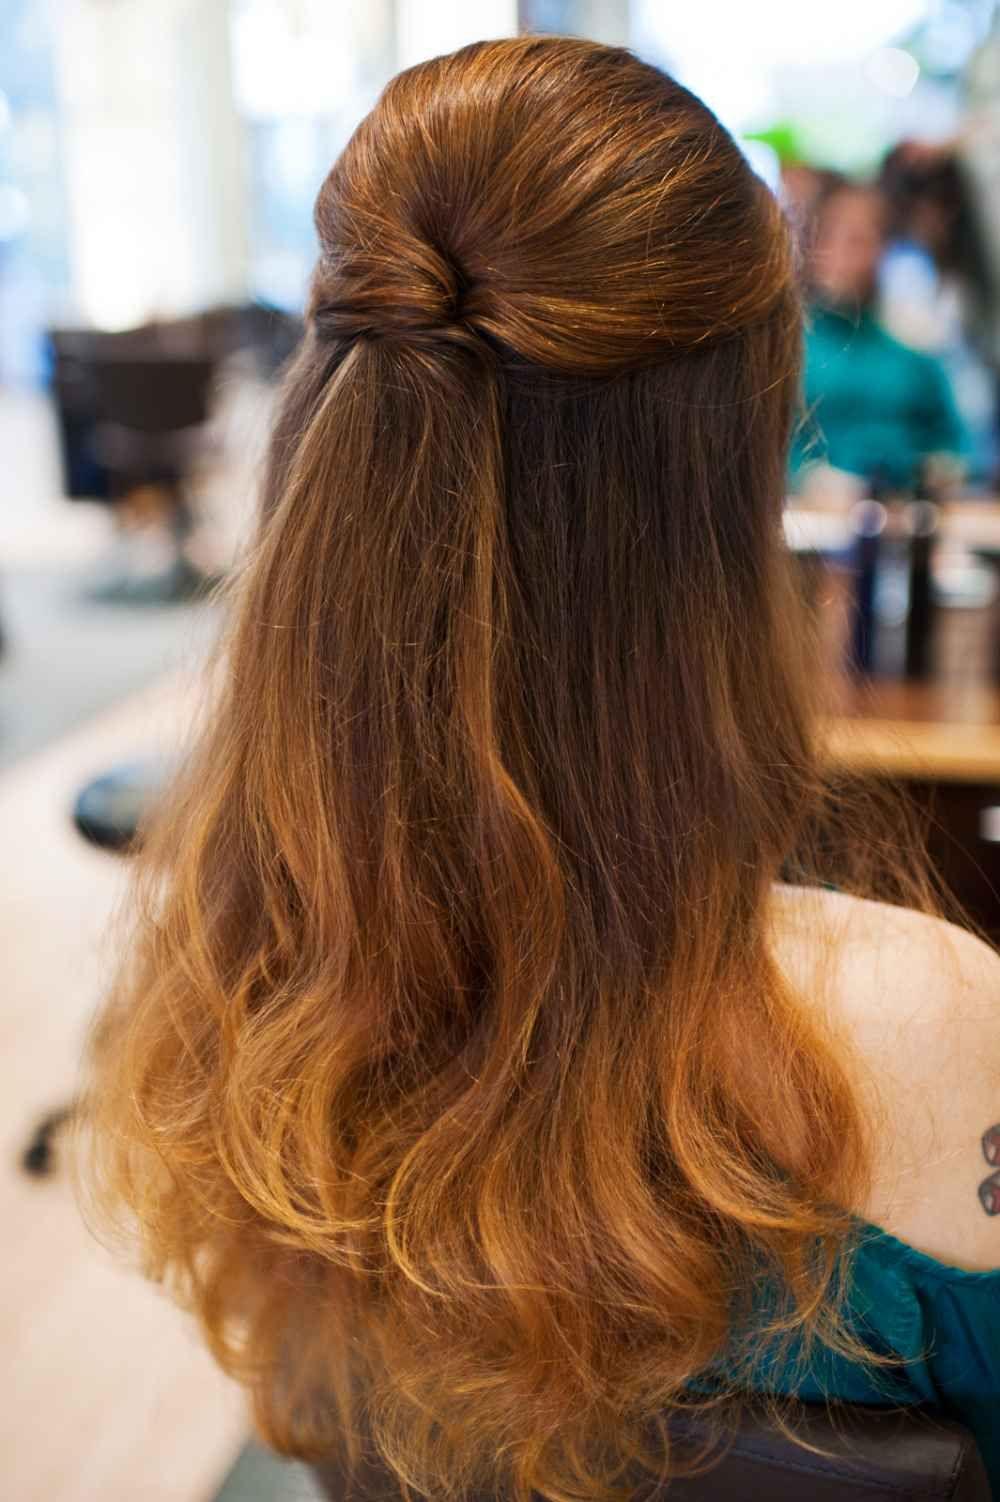 60s hairstyles - how to do retro hair in 2019 | hair. | hair